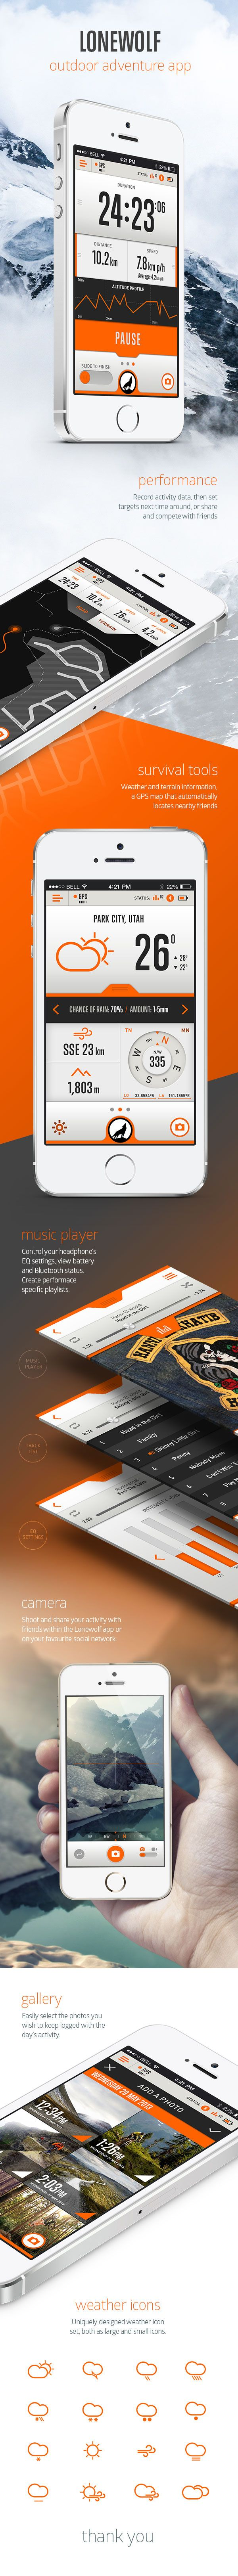 Unique App Design, Lonewolf #App #Design (http://www.pinterest.com/aldenchong/)